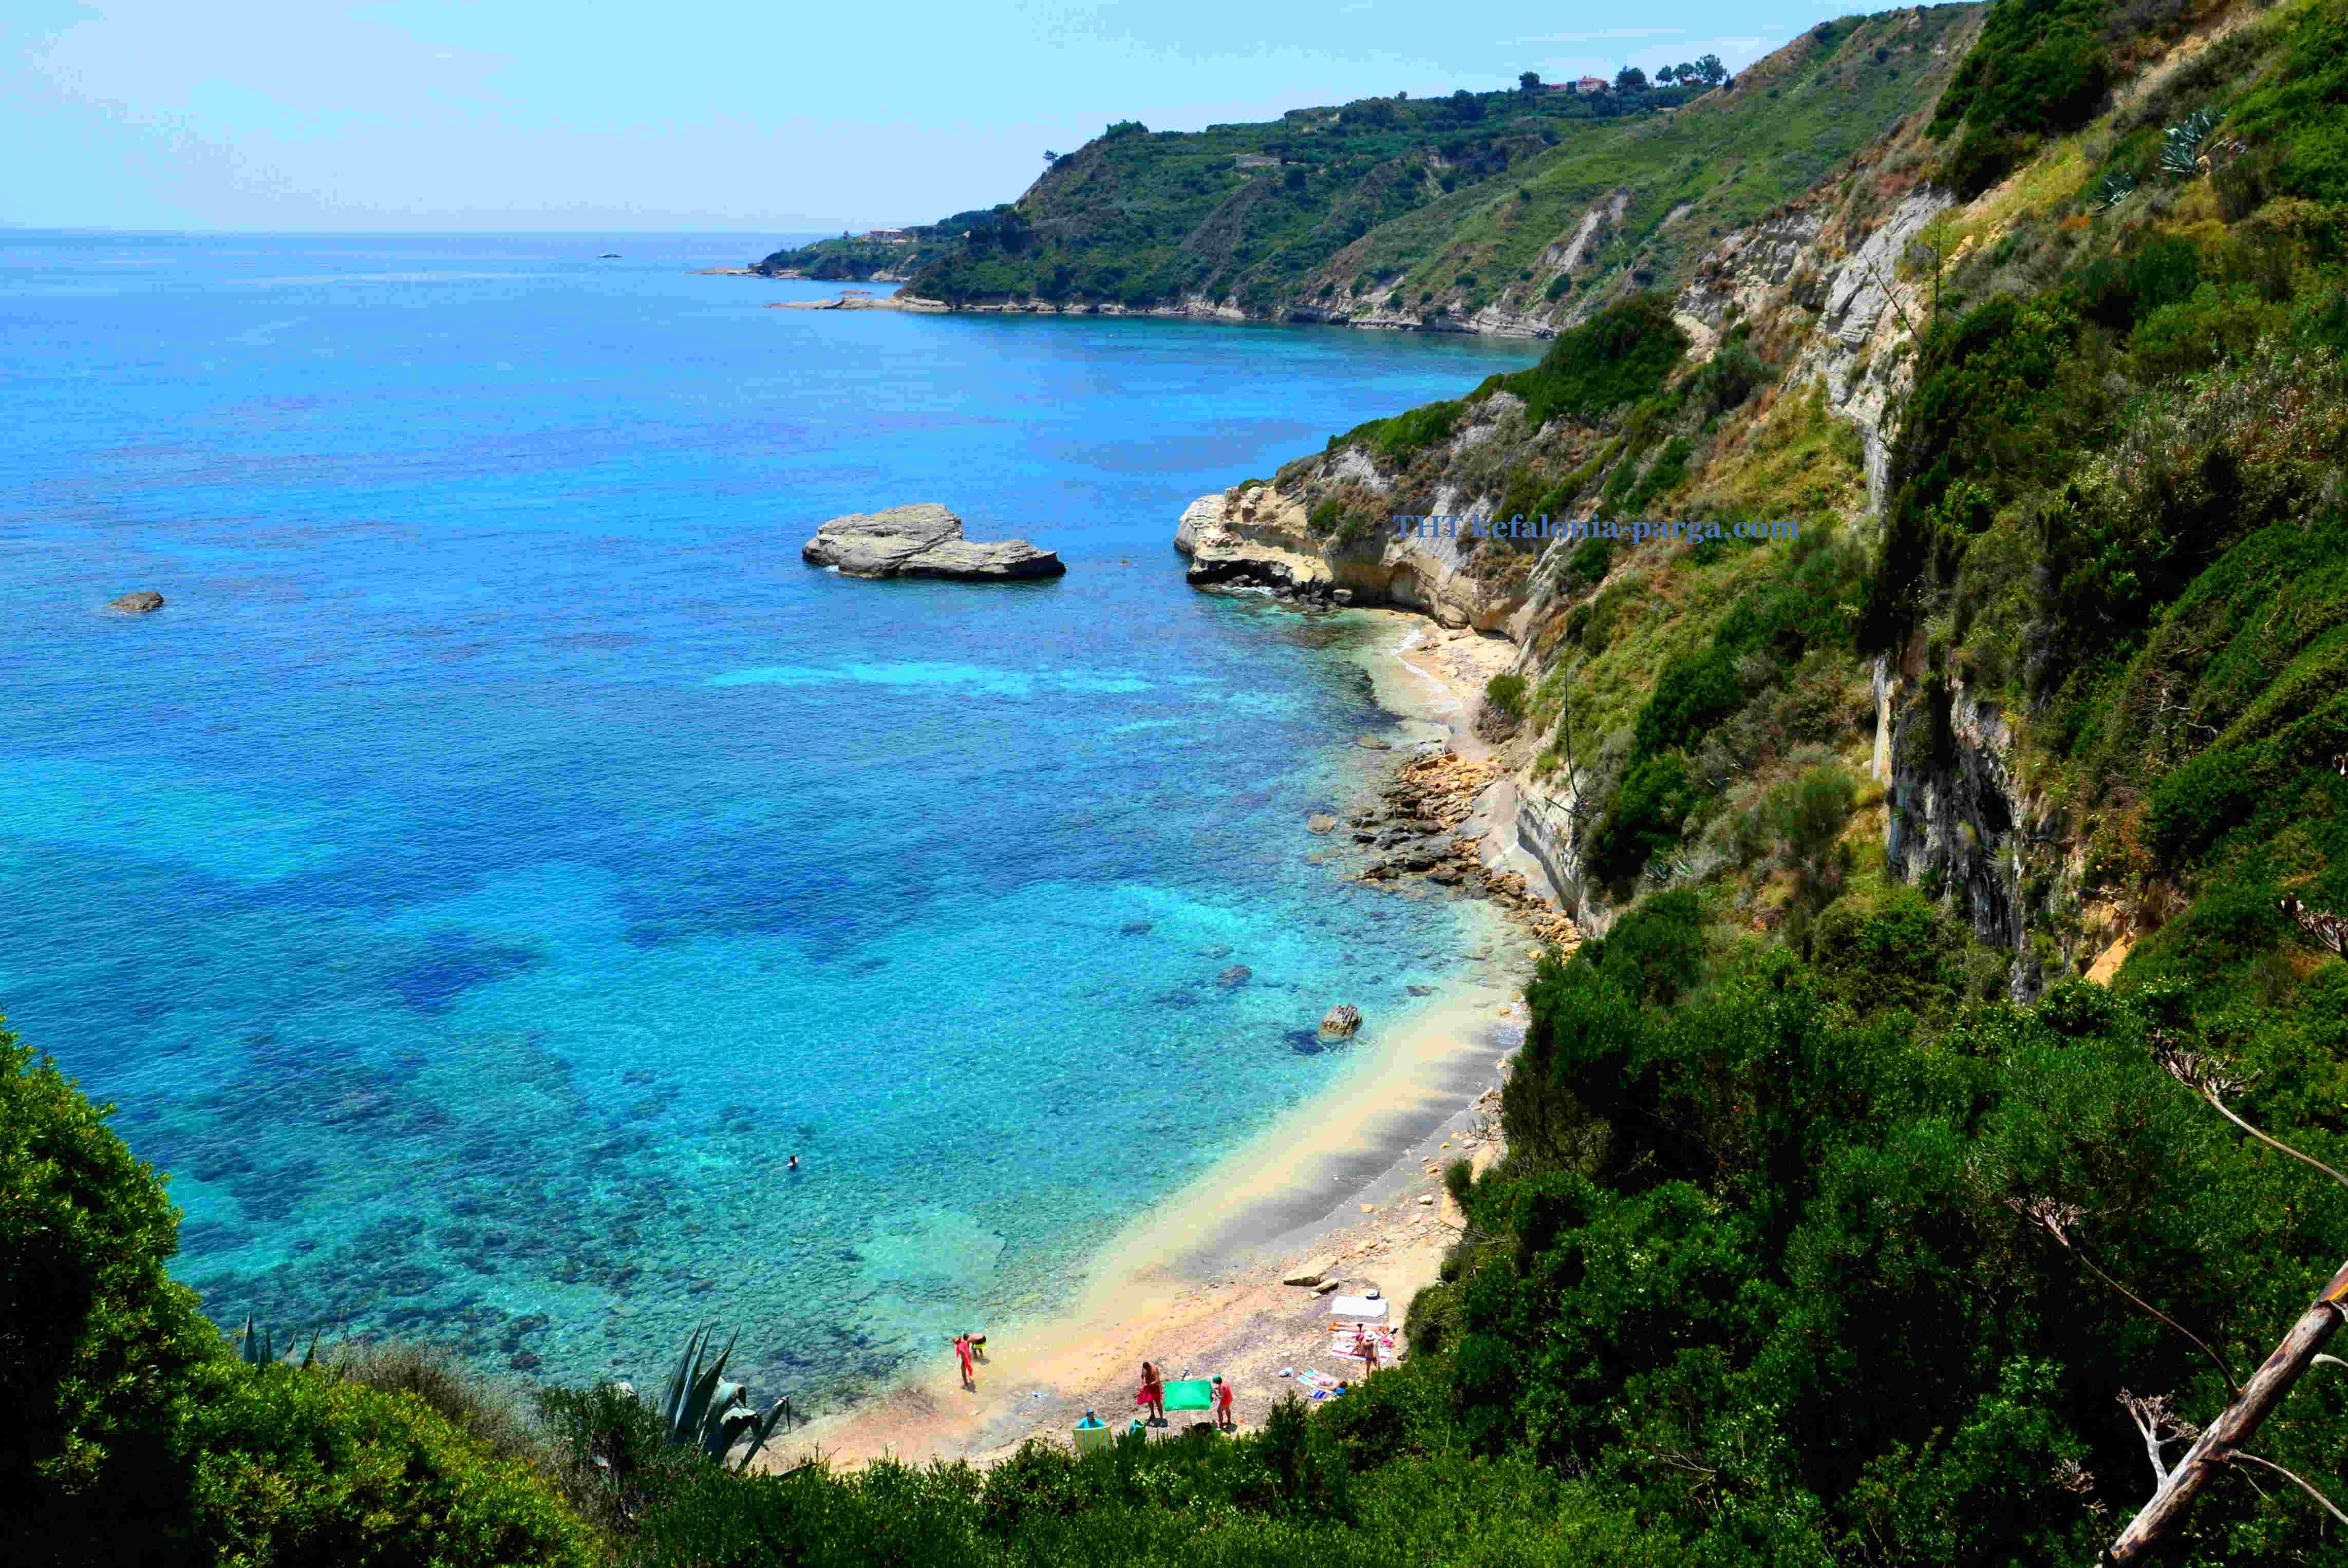 Thermanti beach, Kefaonia, Greece